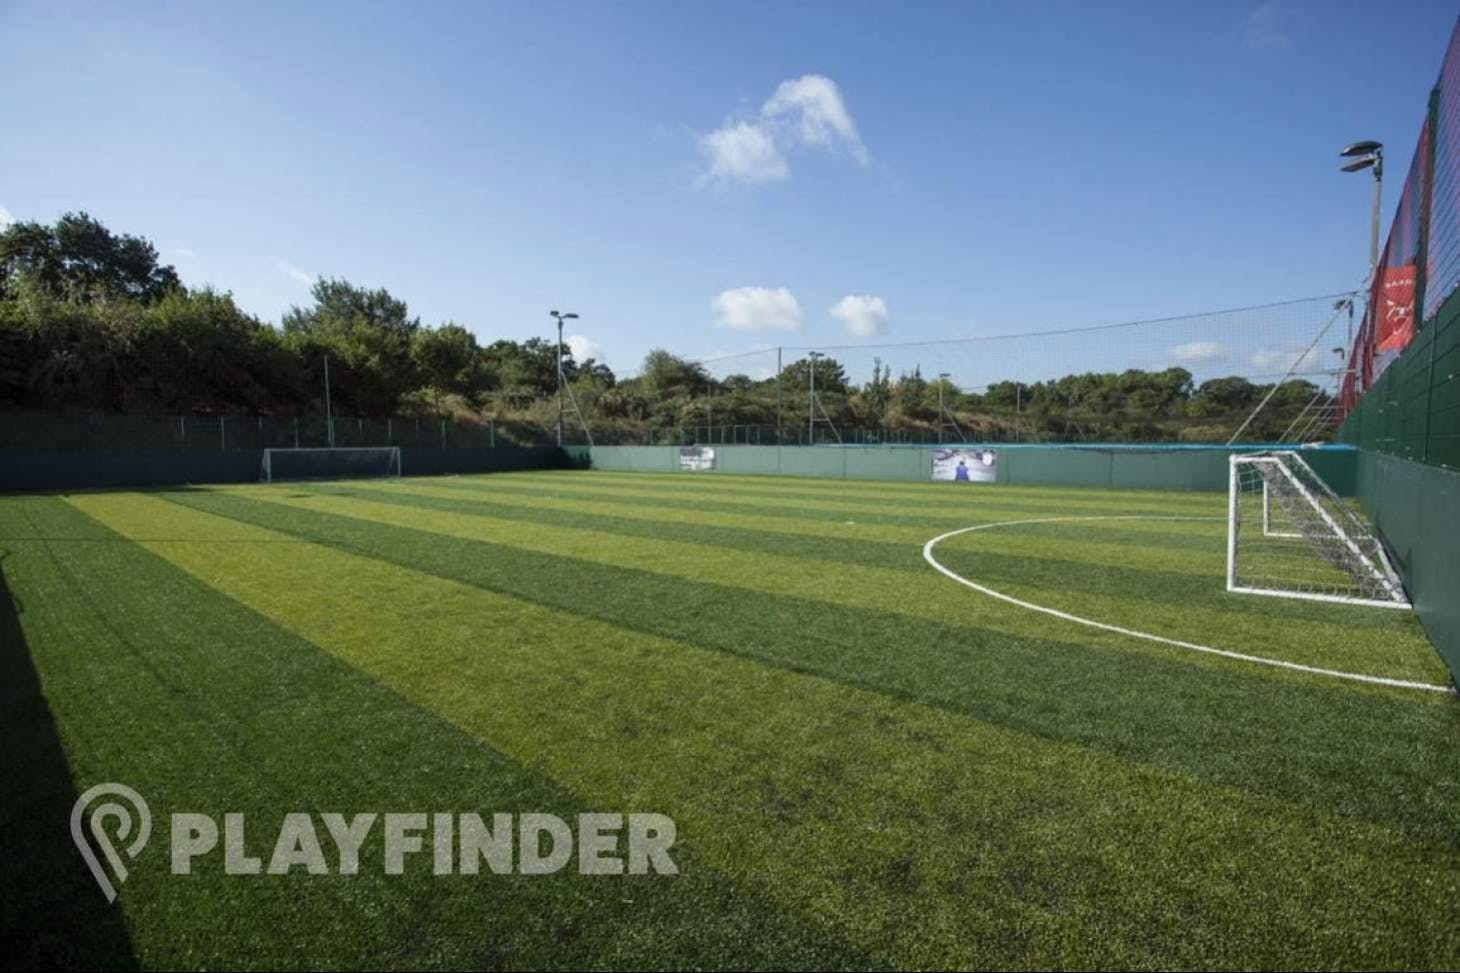 Powerleague Barnet 3 a side   3G Astroturf football pitch